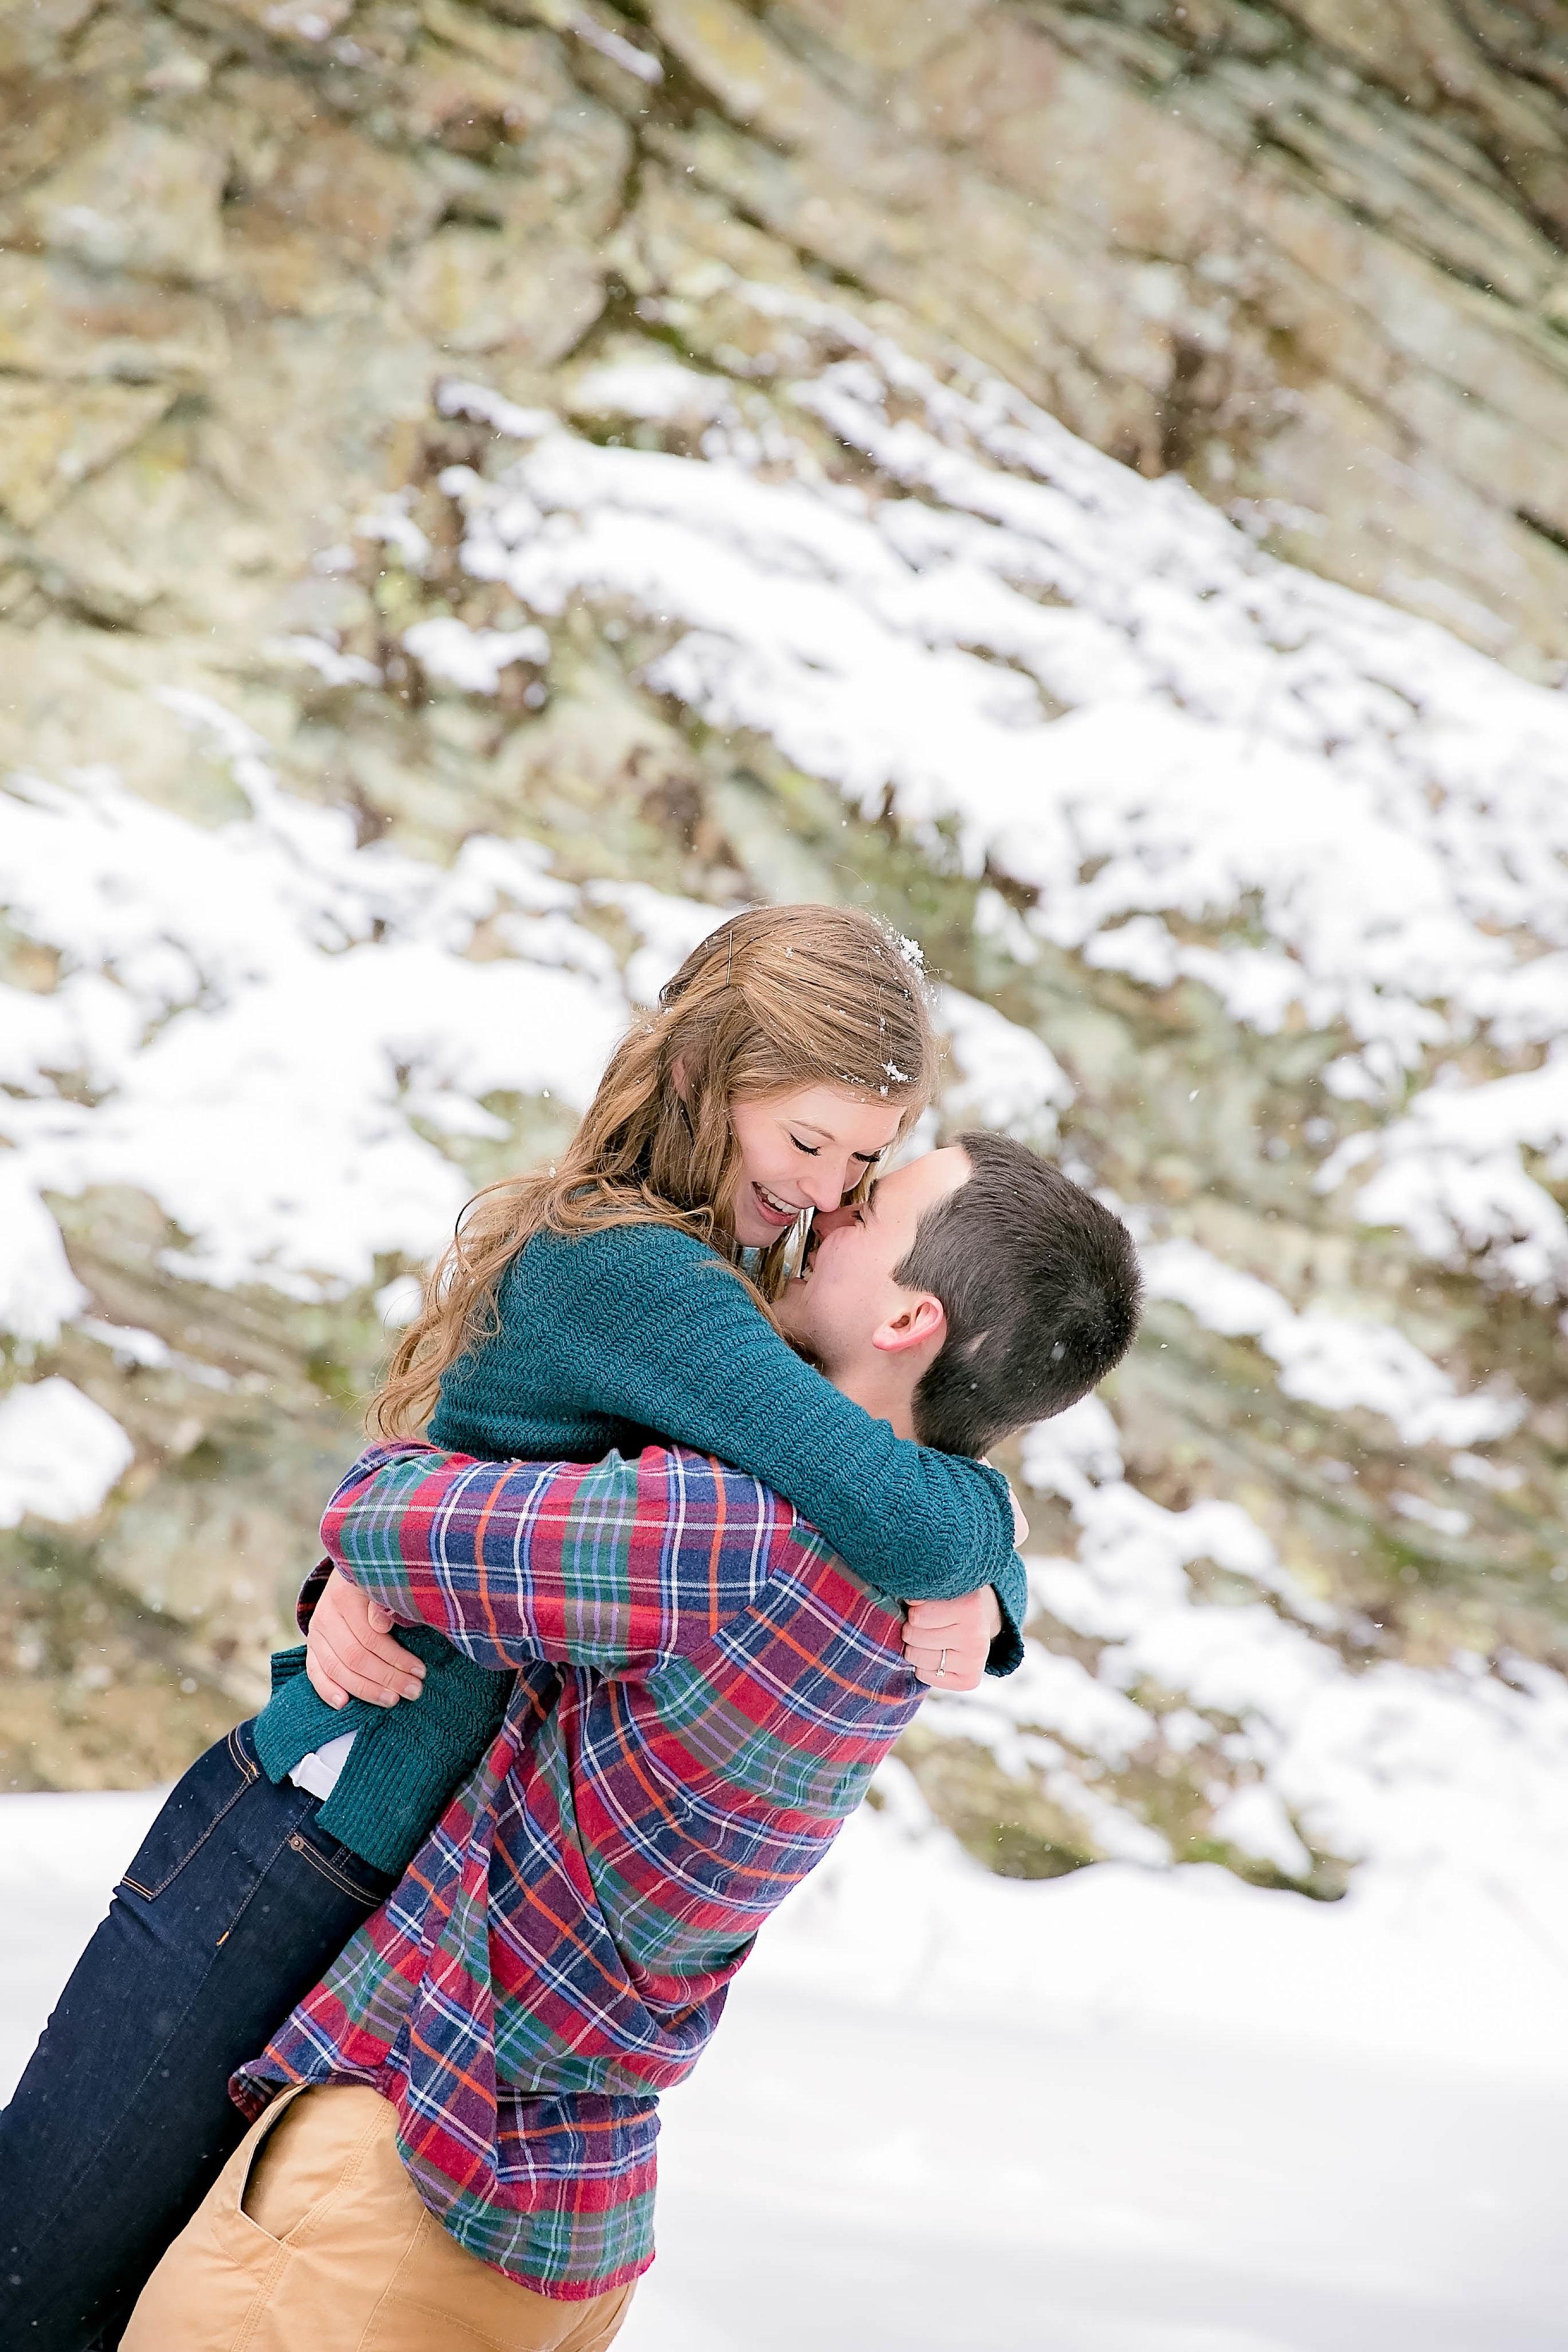 Playful embrace, engagement session